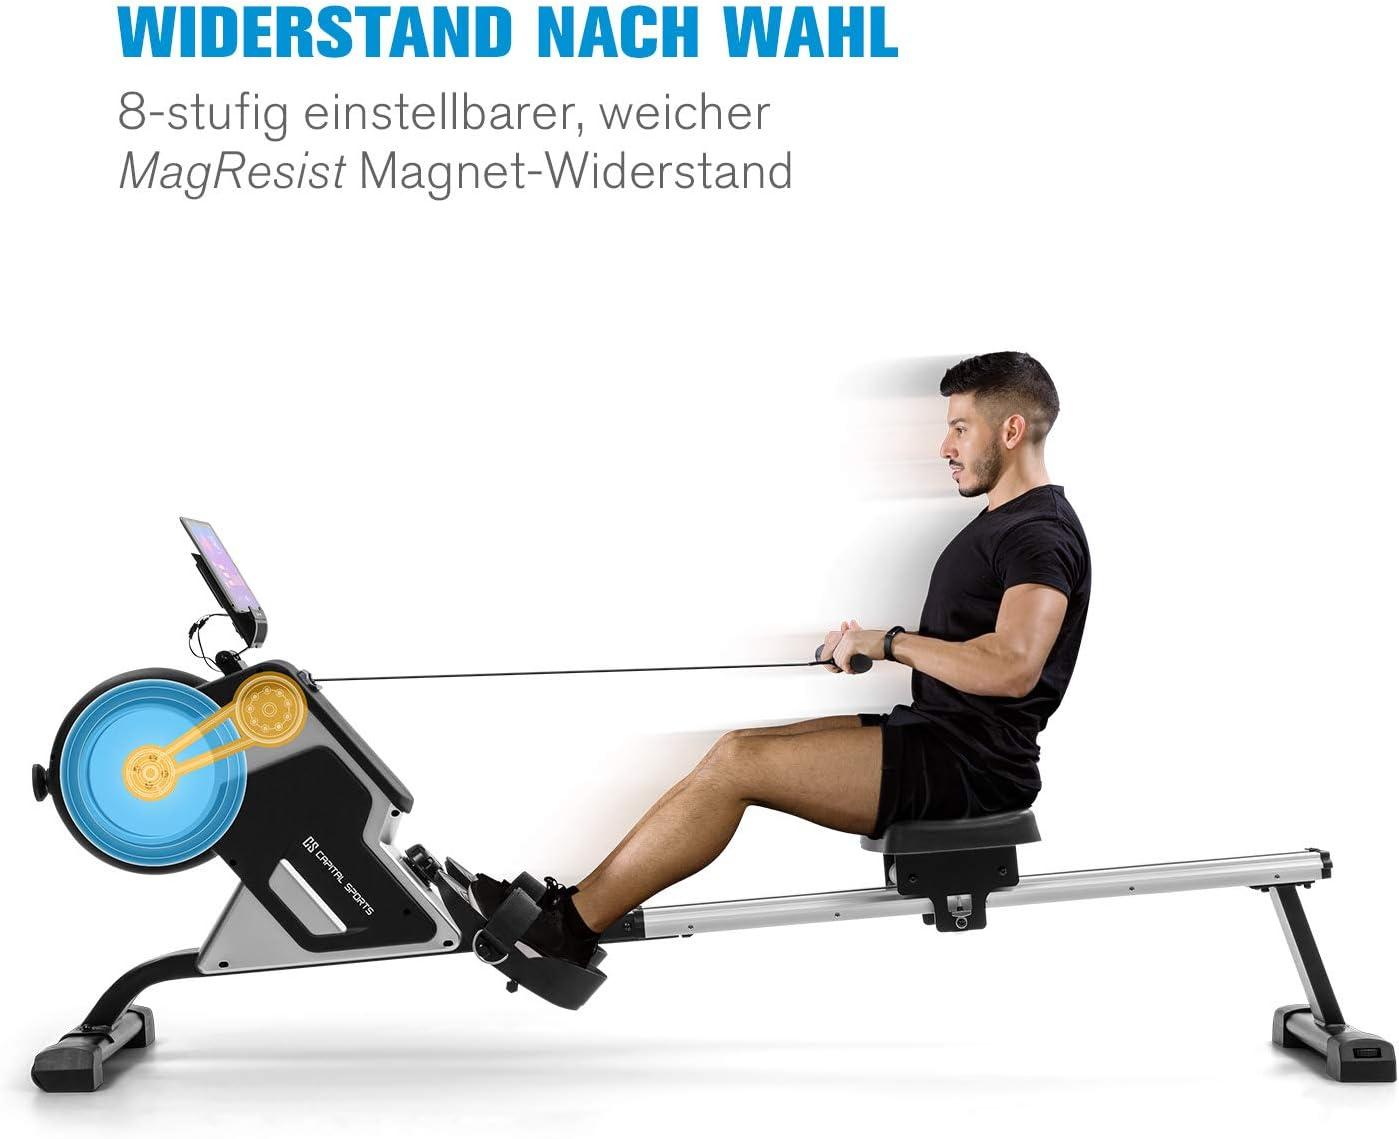 Capital Sports Stream M1 Rudergerät - Magnetwiderstand